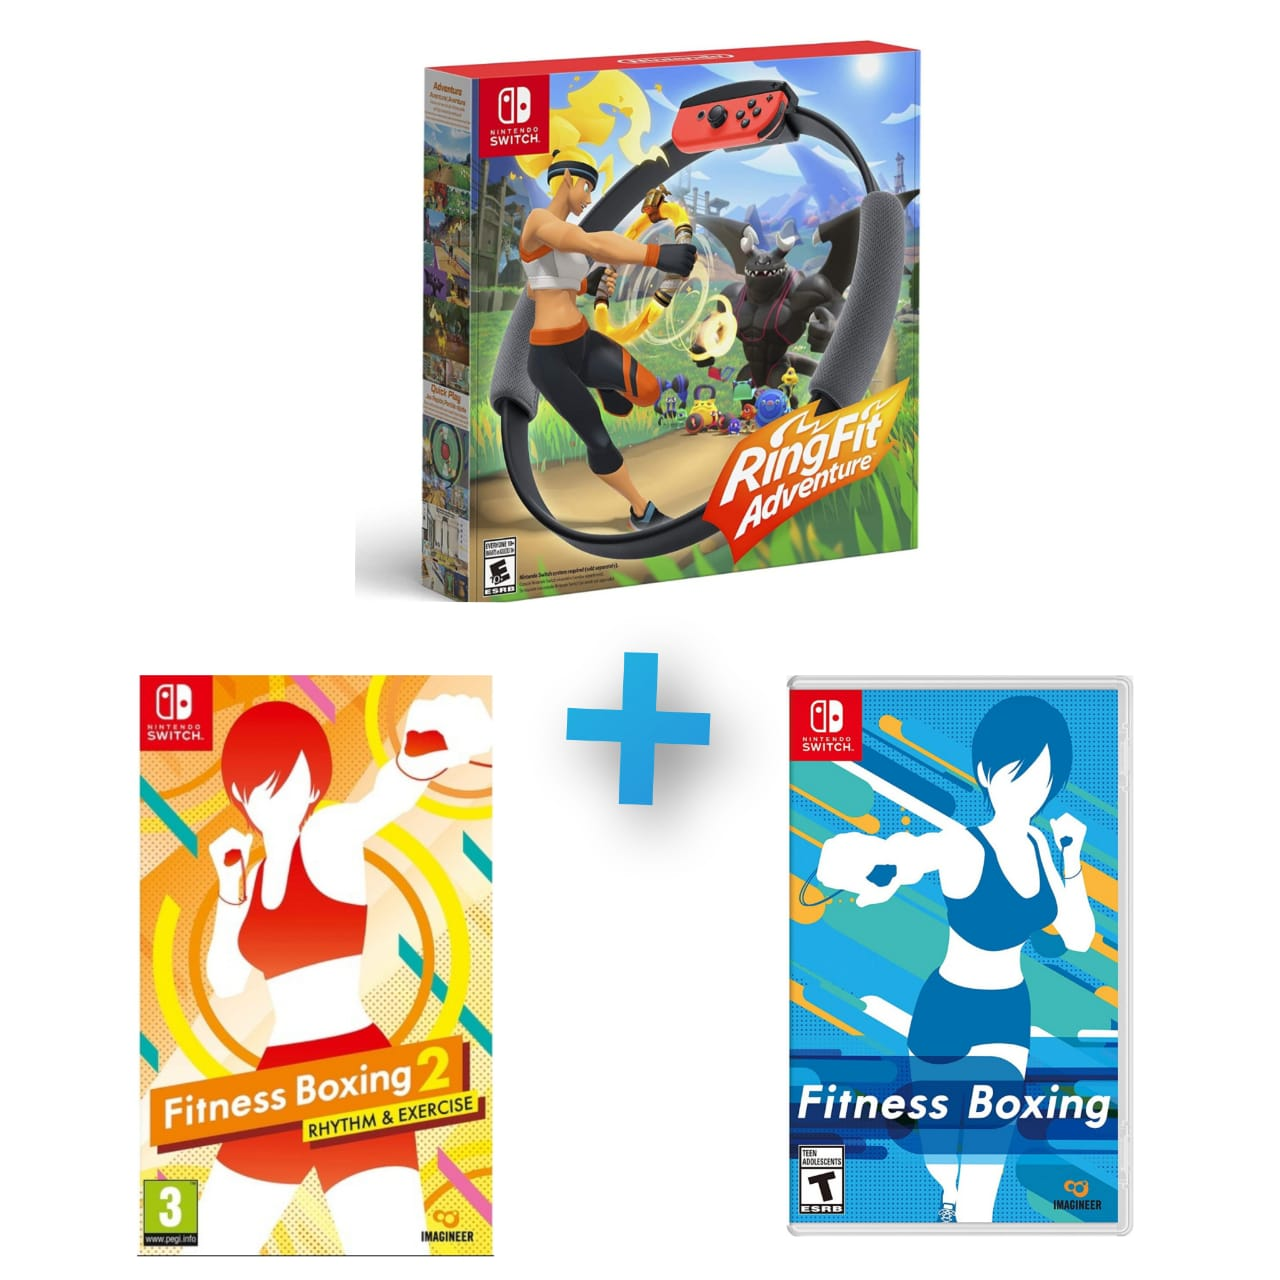 Kit Fitness Boxing 1 e 2 + Ring Fit Adventure - Nintendo Switch